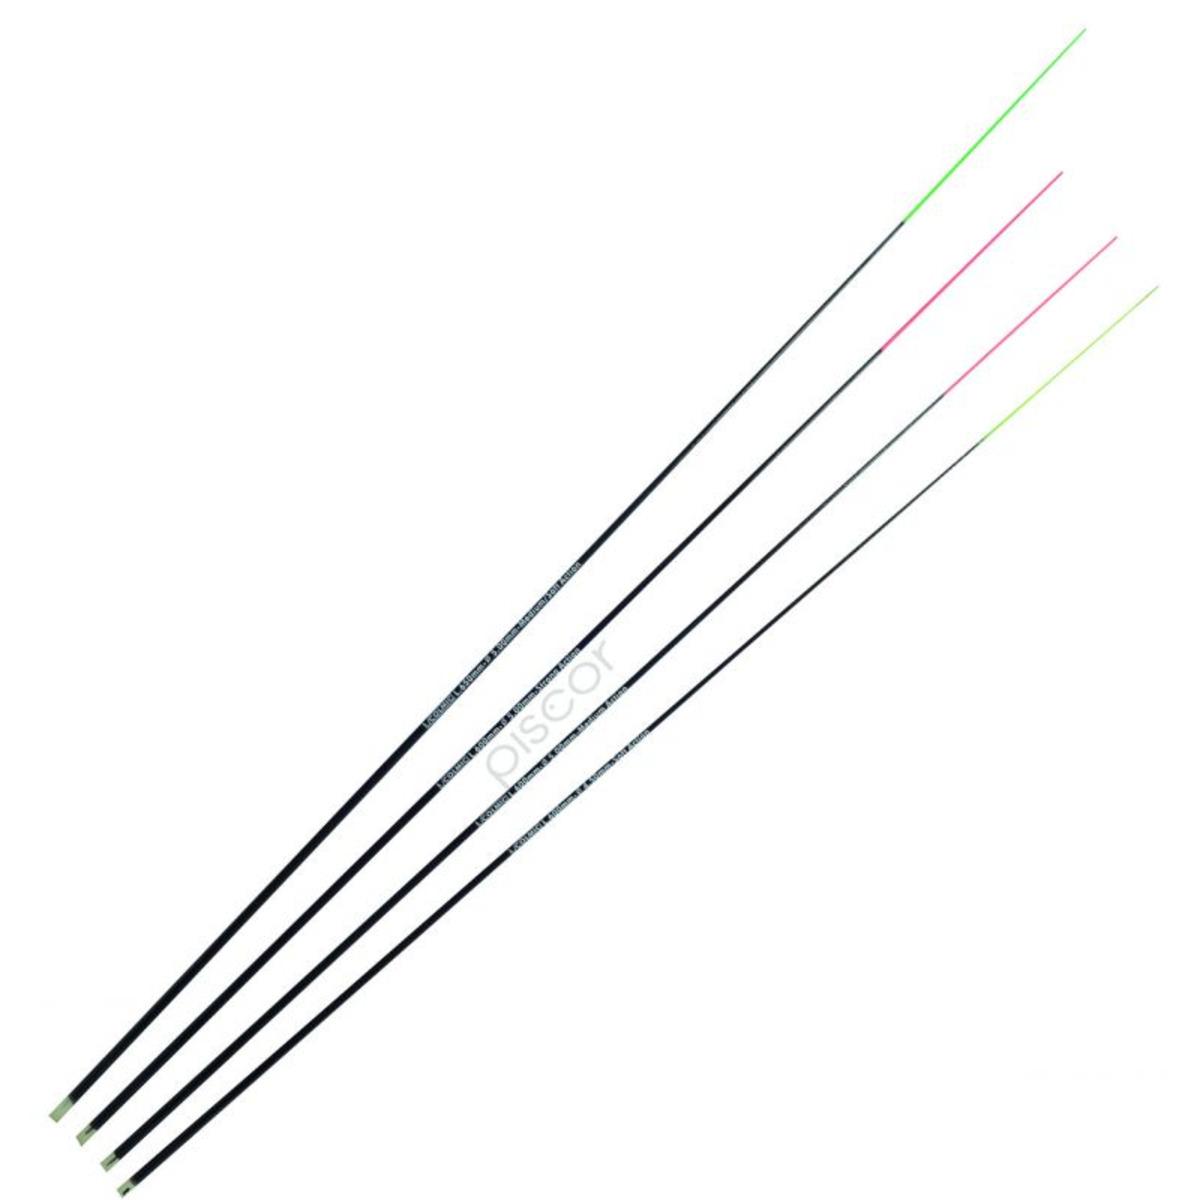 Colmic Pico Fiberglass Tips Medium 600 mm - Medium - Orange - Desnuda - Longitud 600 mm - Parte Trasera 5.0 mm